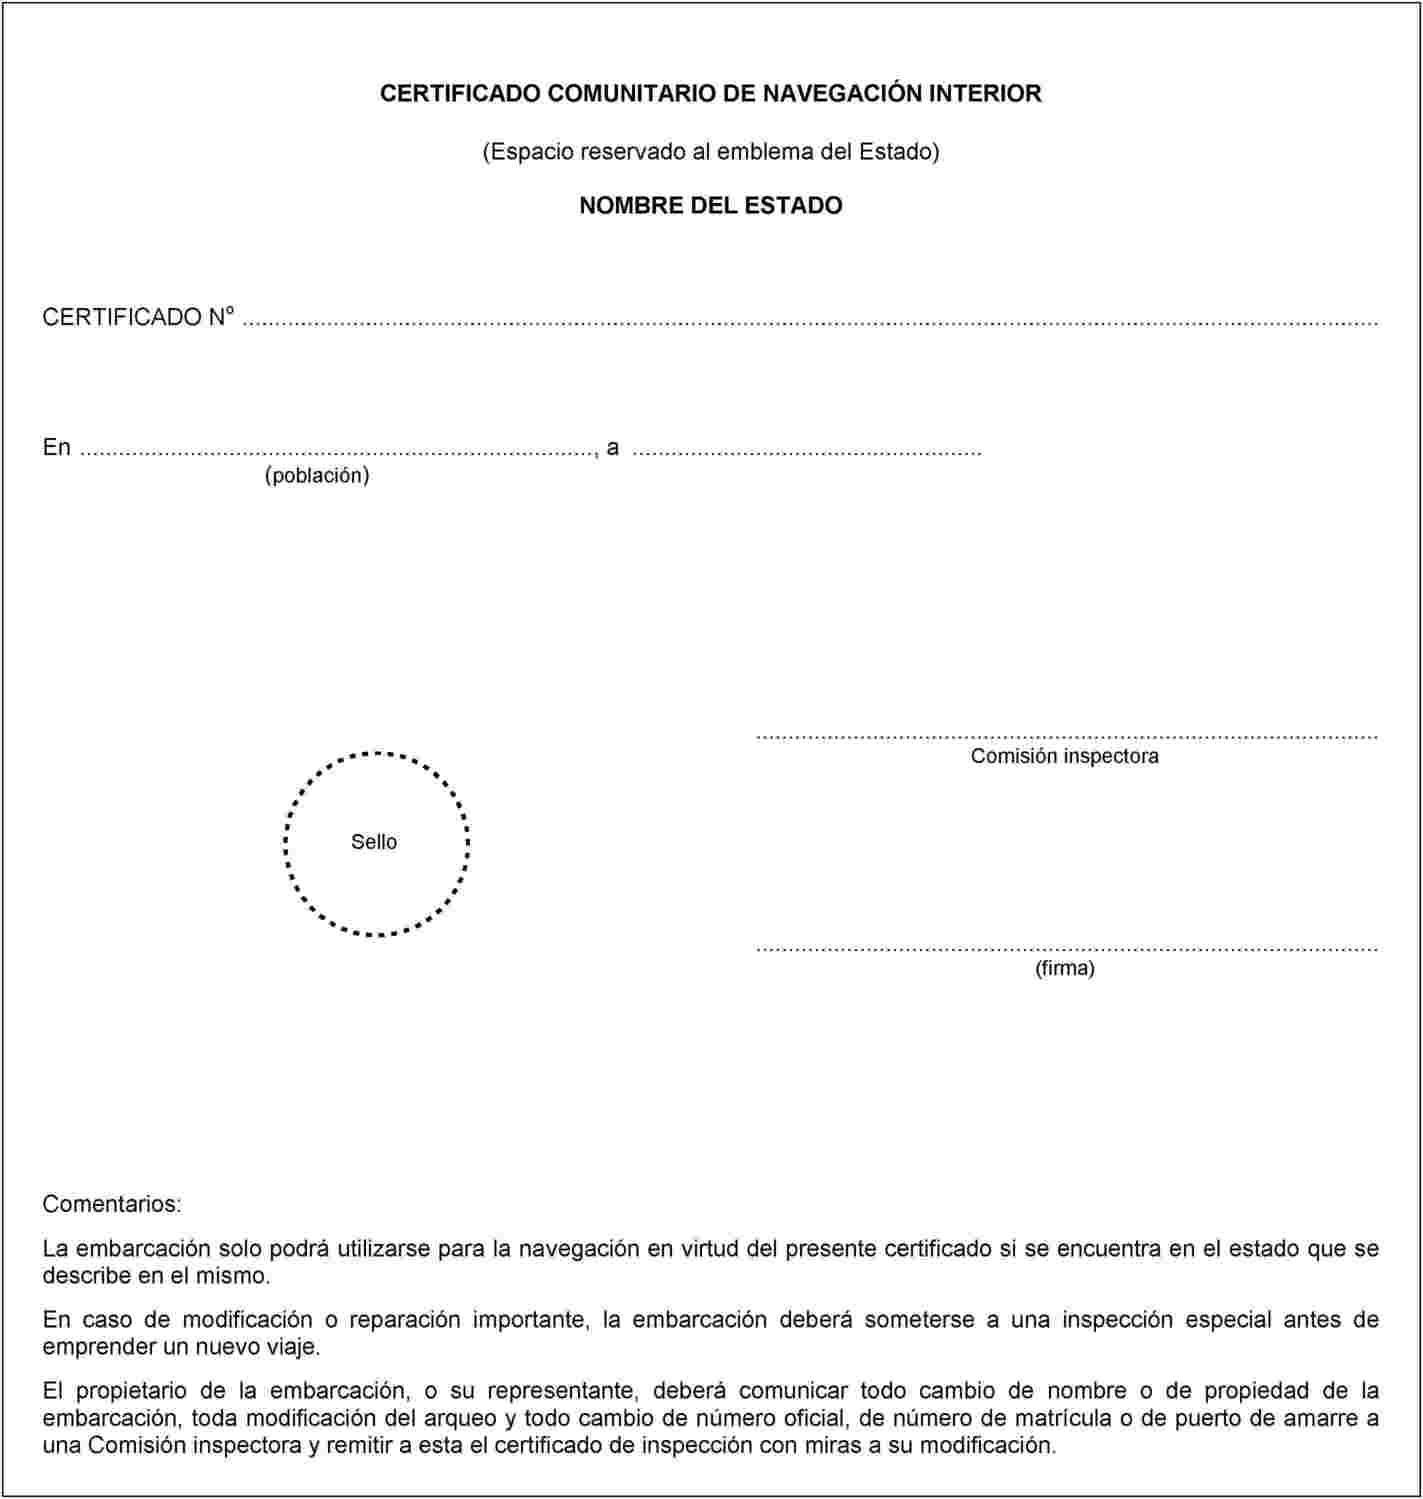 EUR-Lex - 52006AG0008 - EN - EUR-Lex